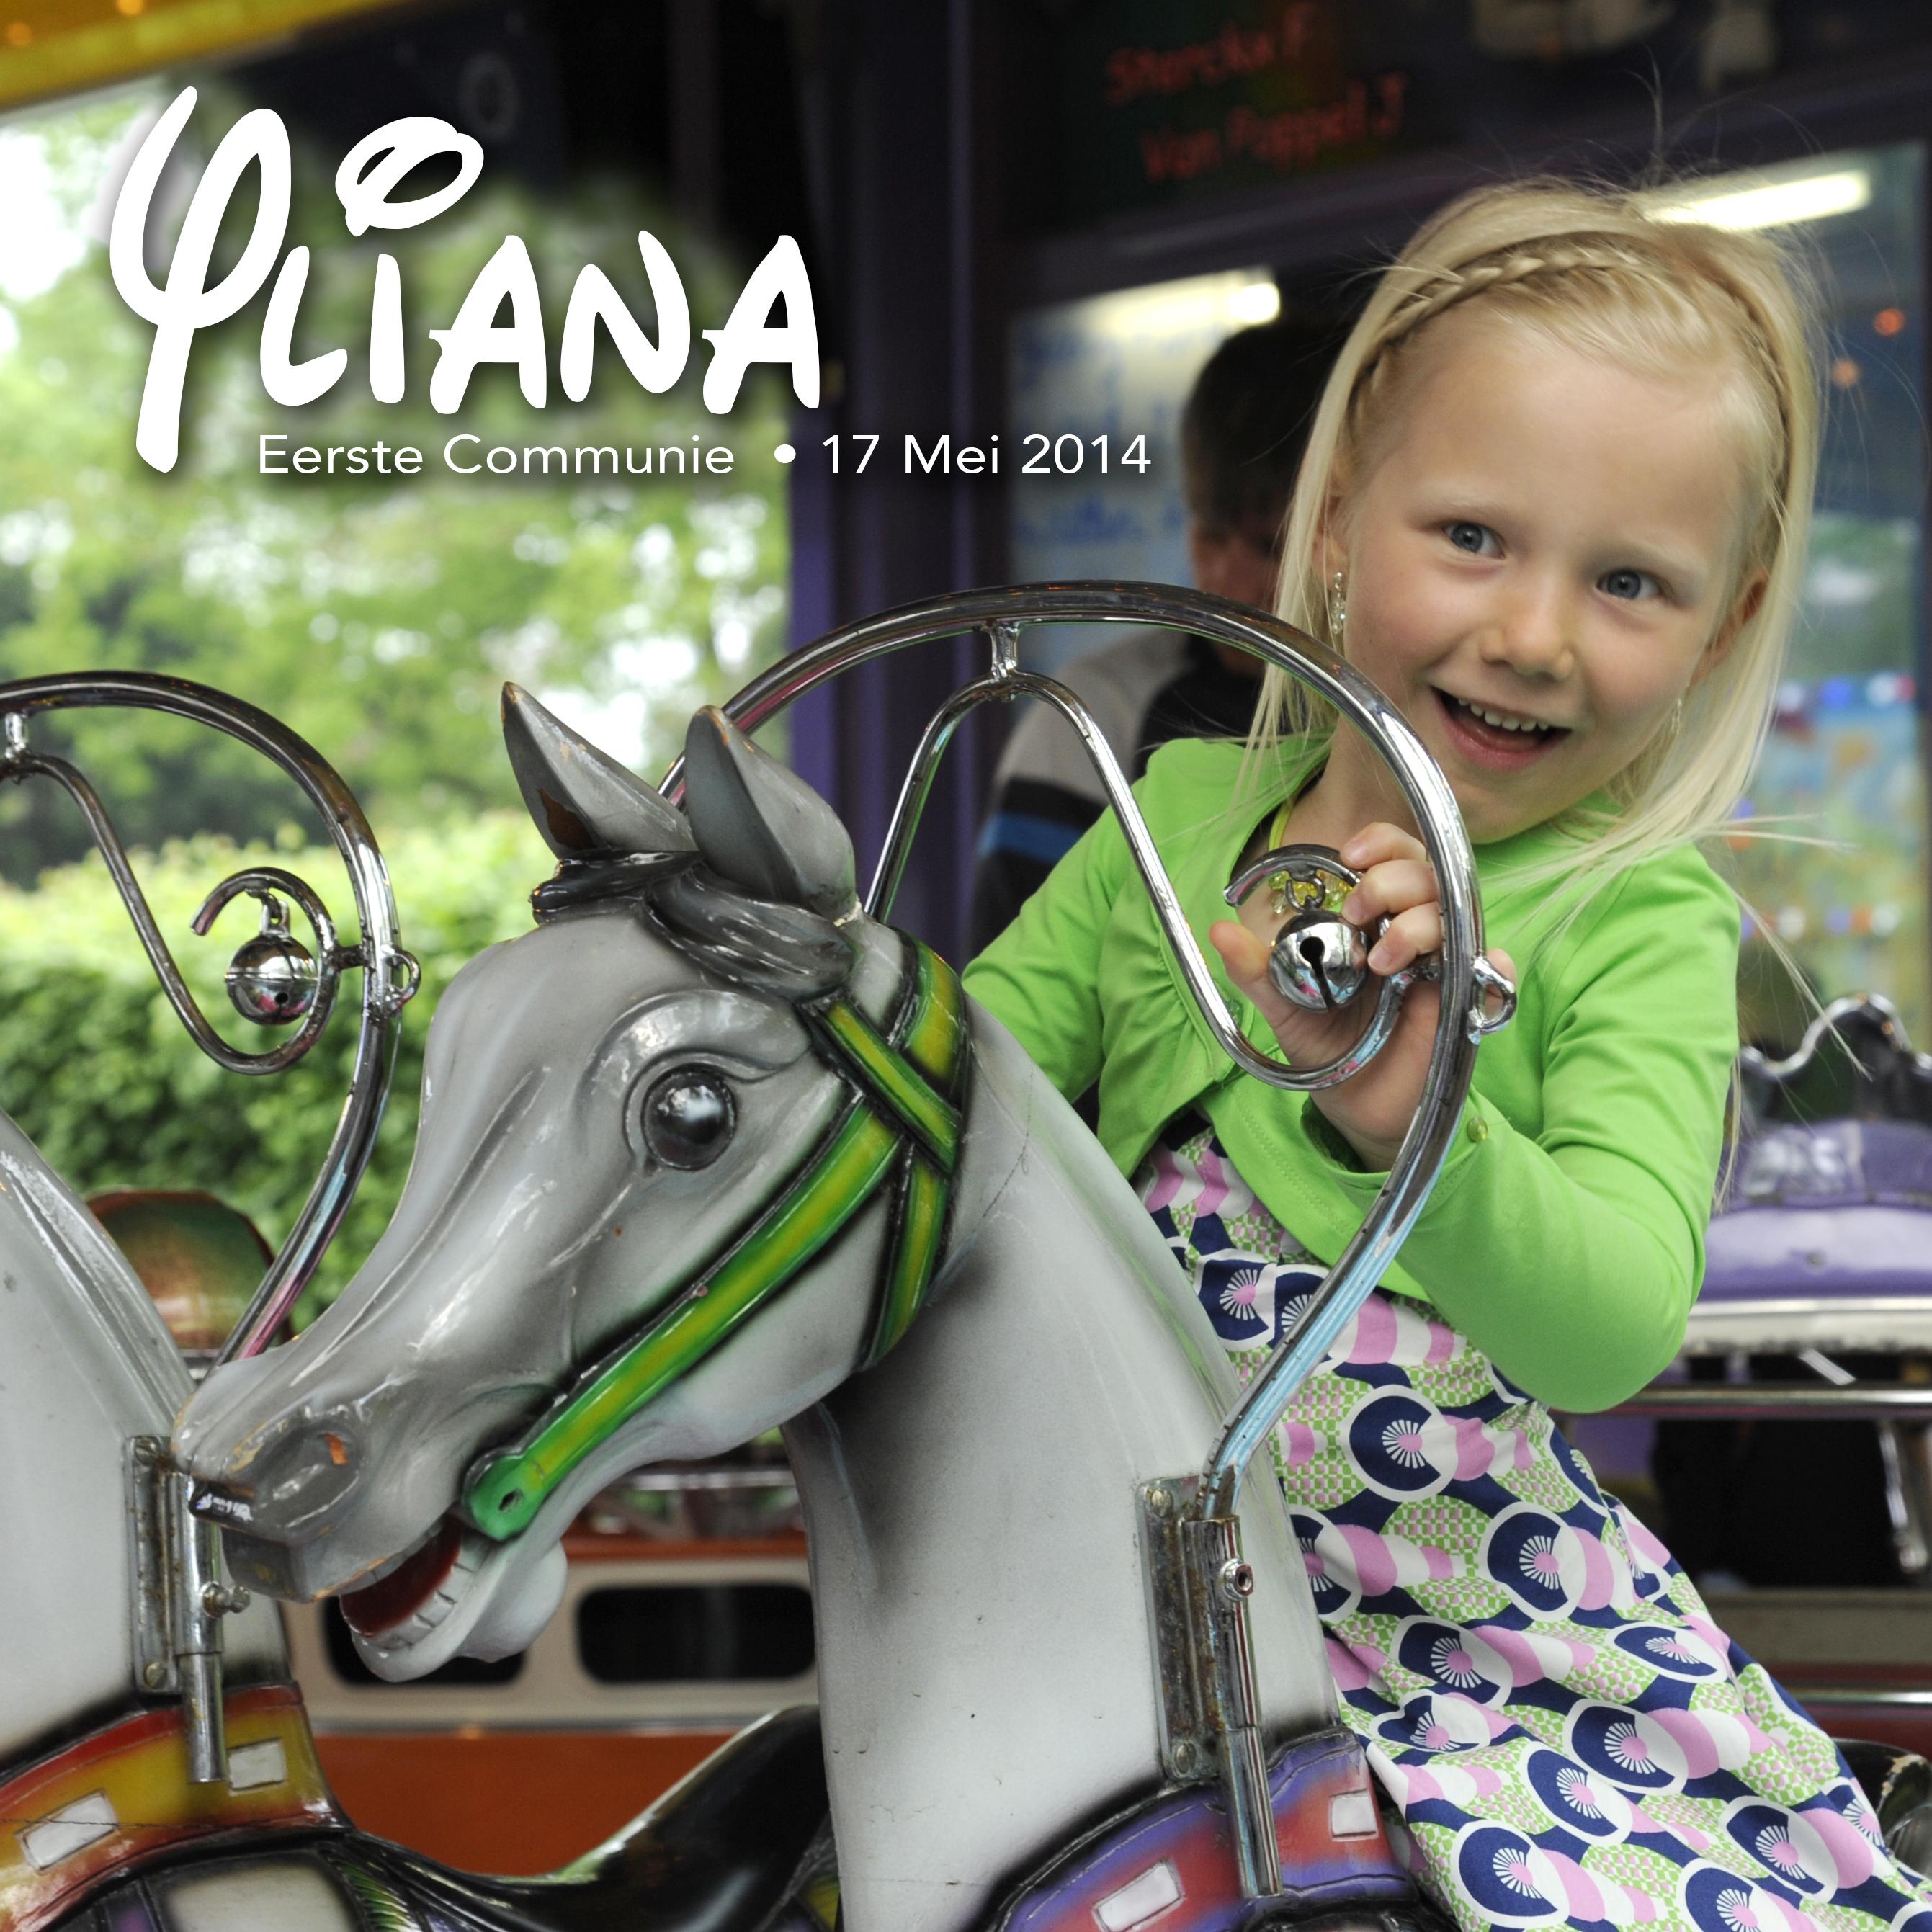 Yliana, eerste communie